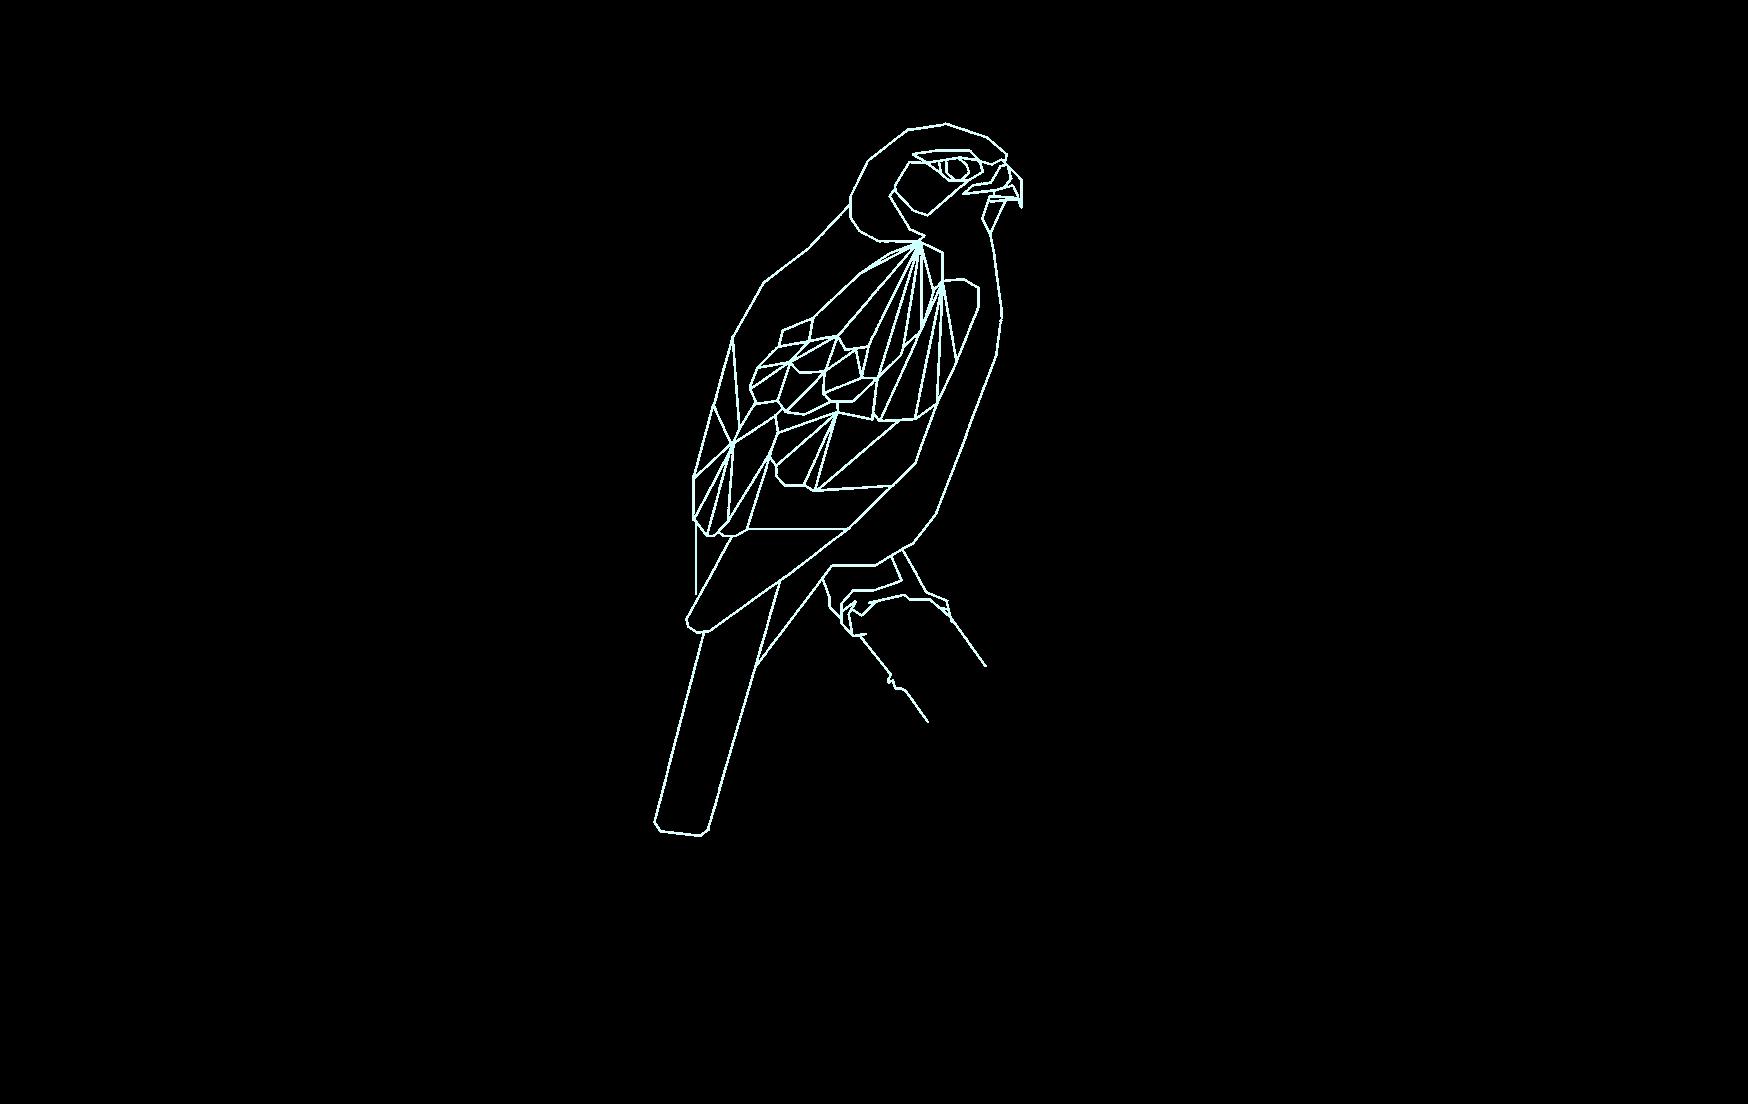 Sparrowhawk